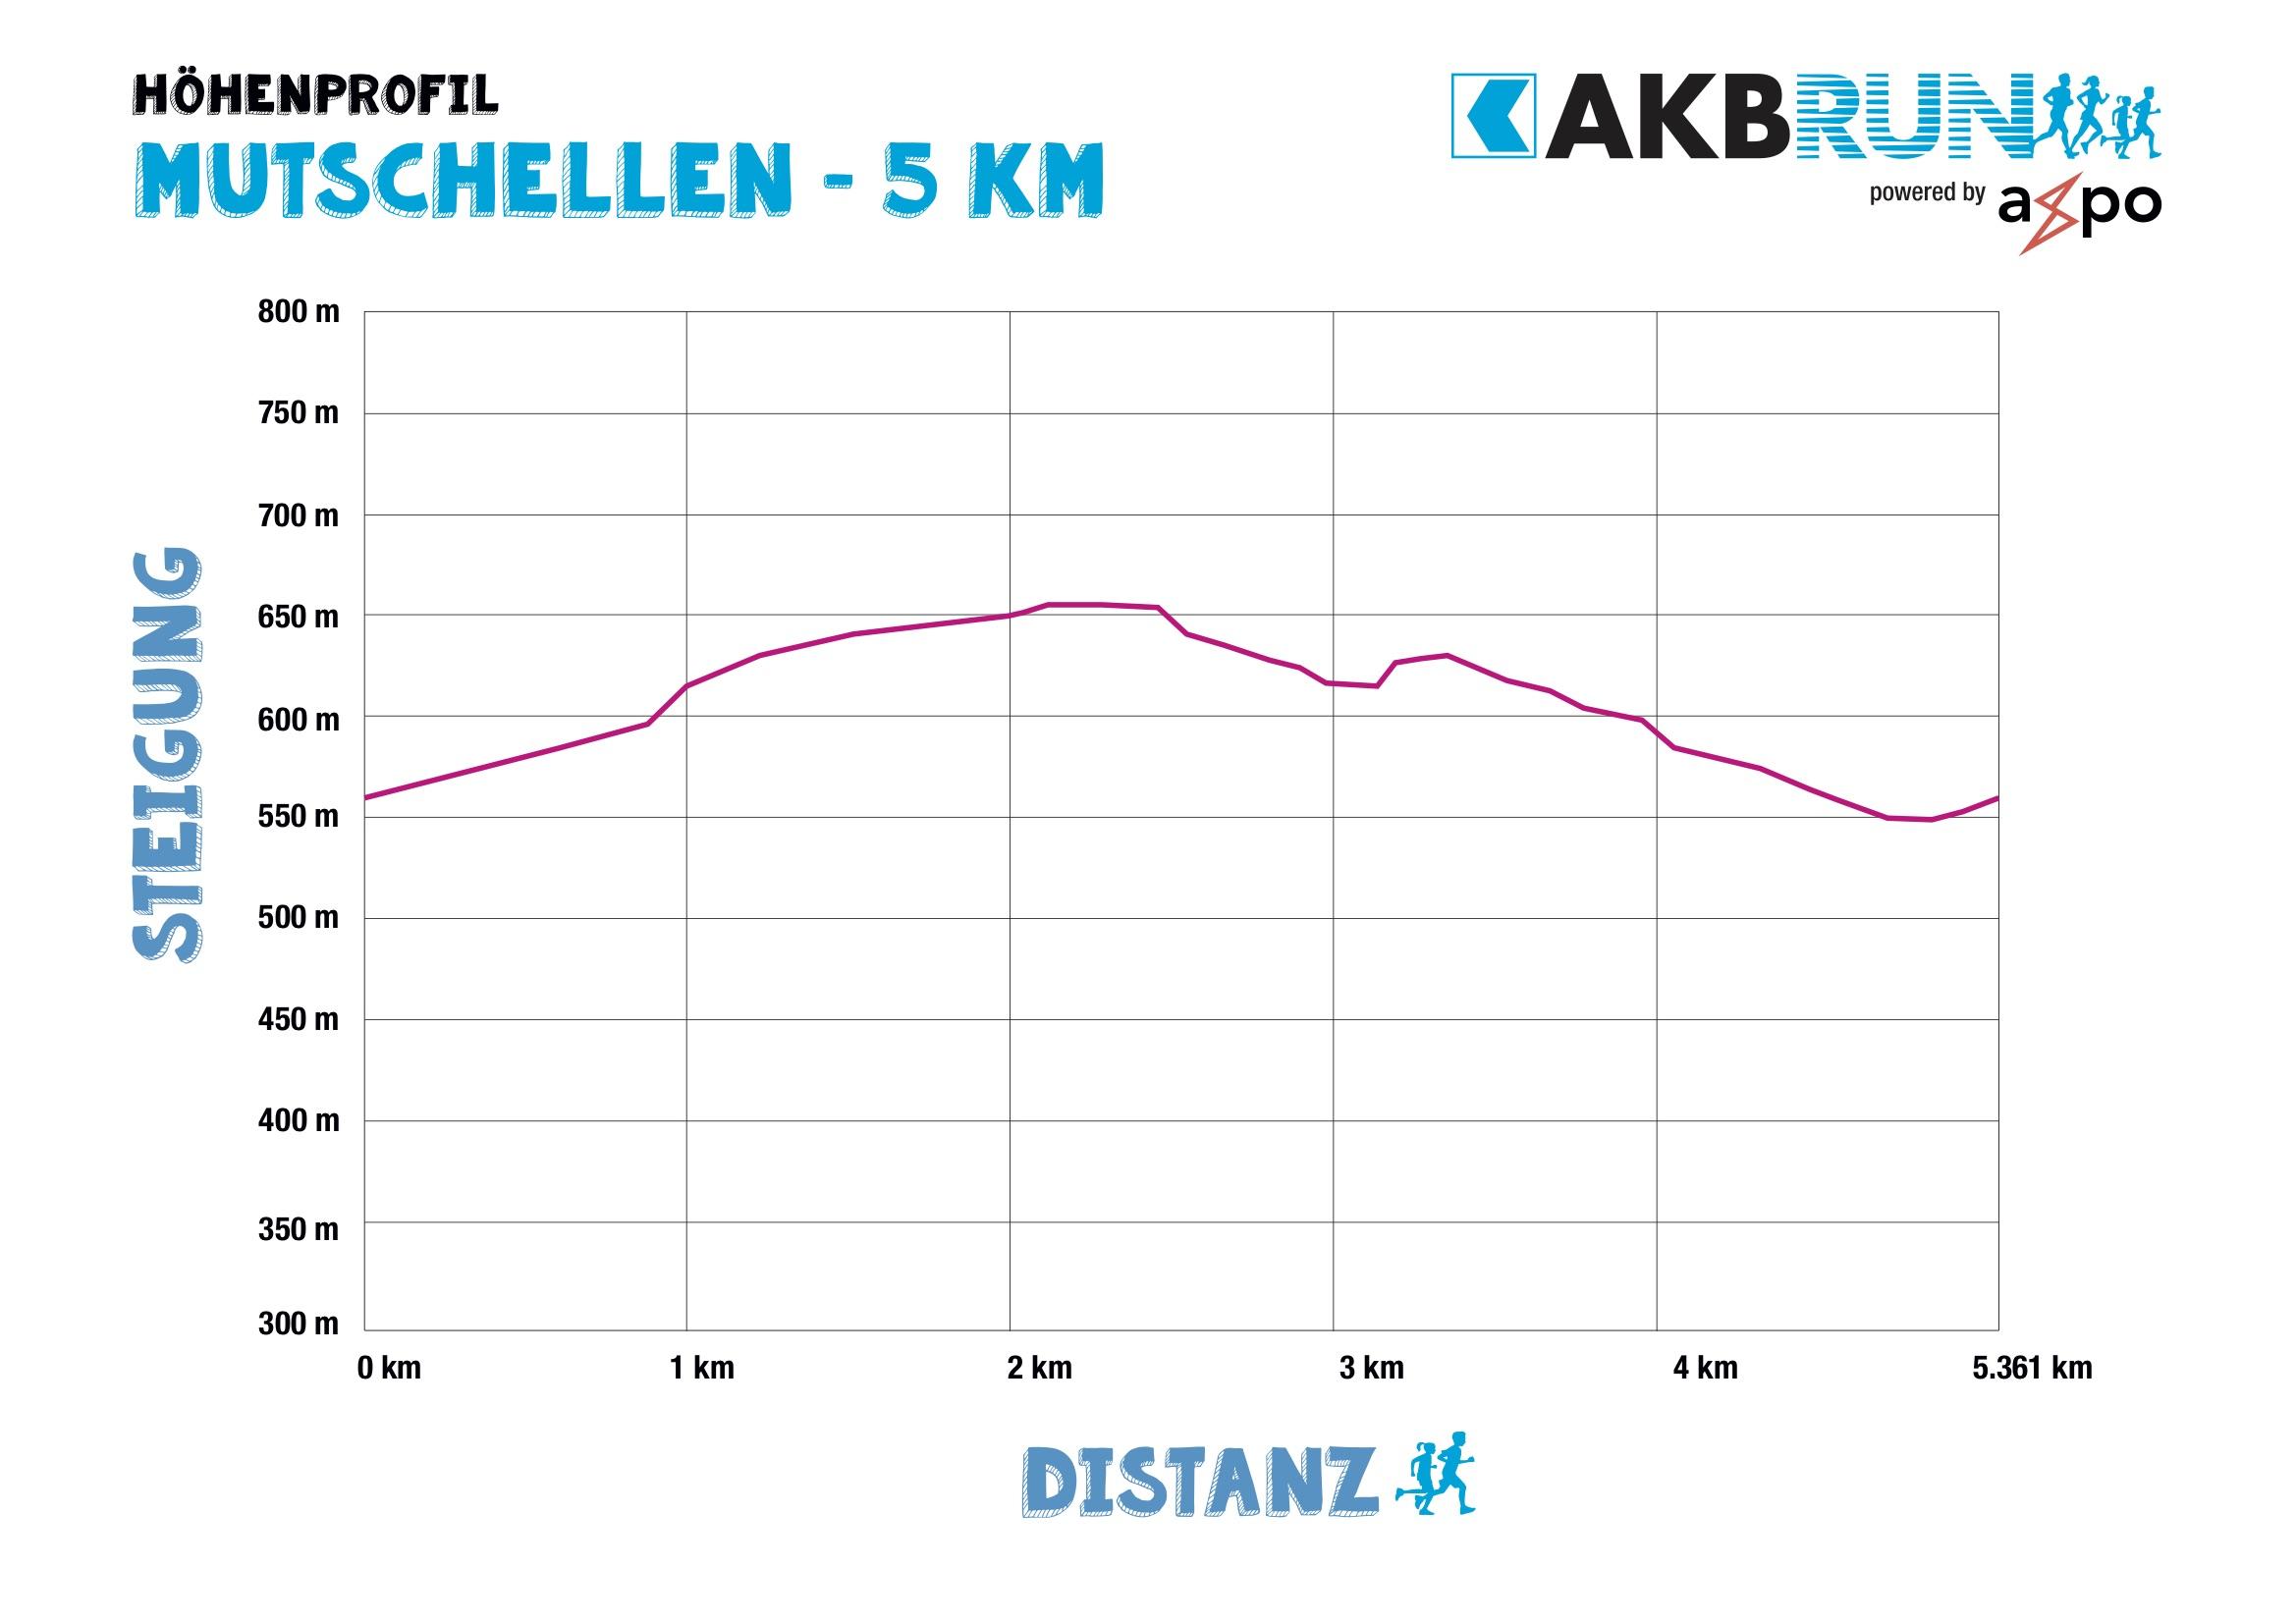 AKB_Run_Hoehenprofile_Mutschellen_5km Kopie.jpg